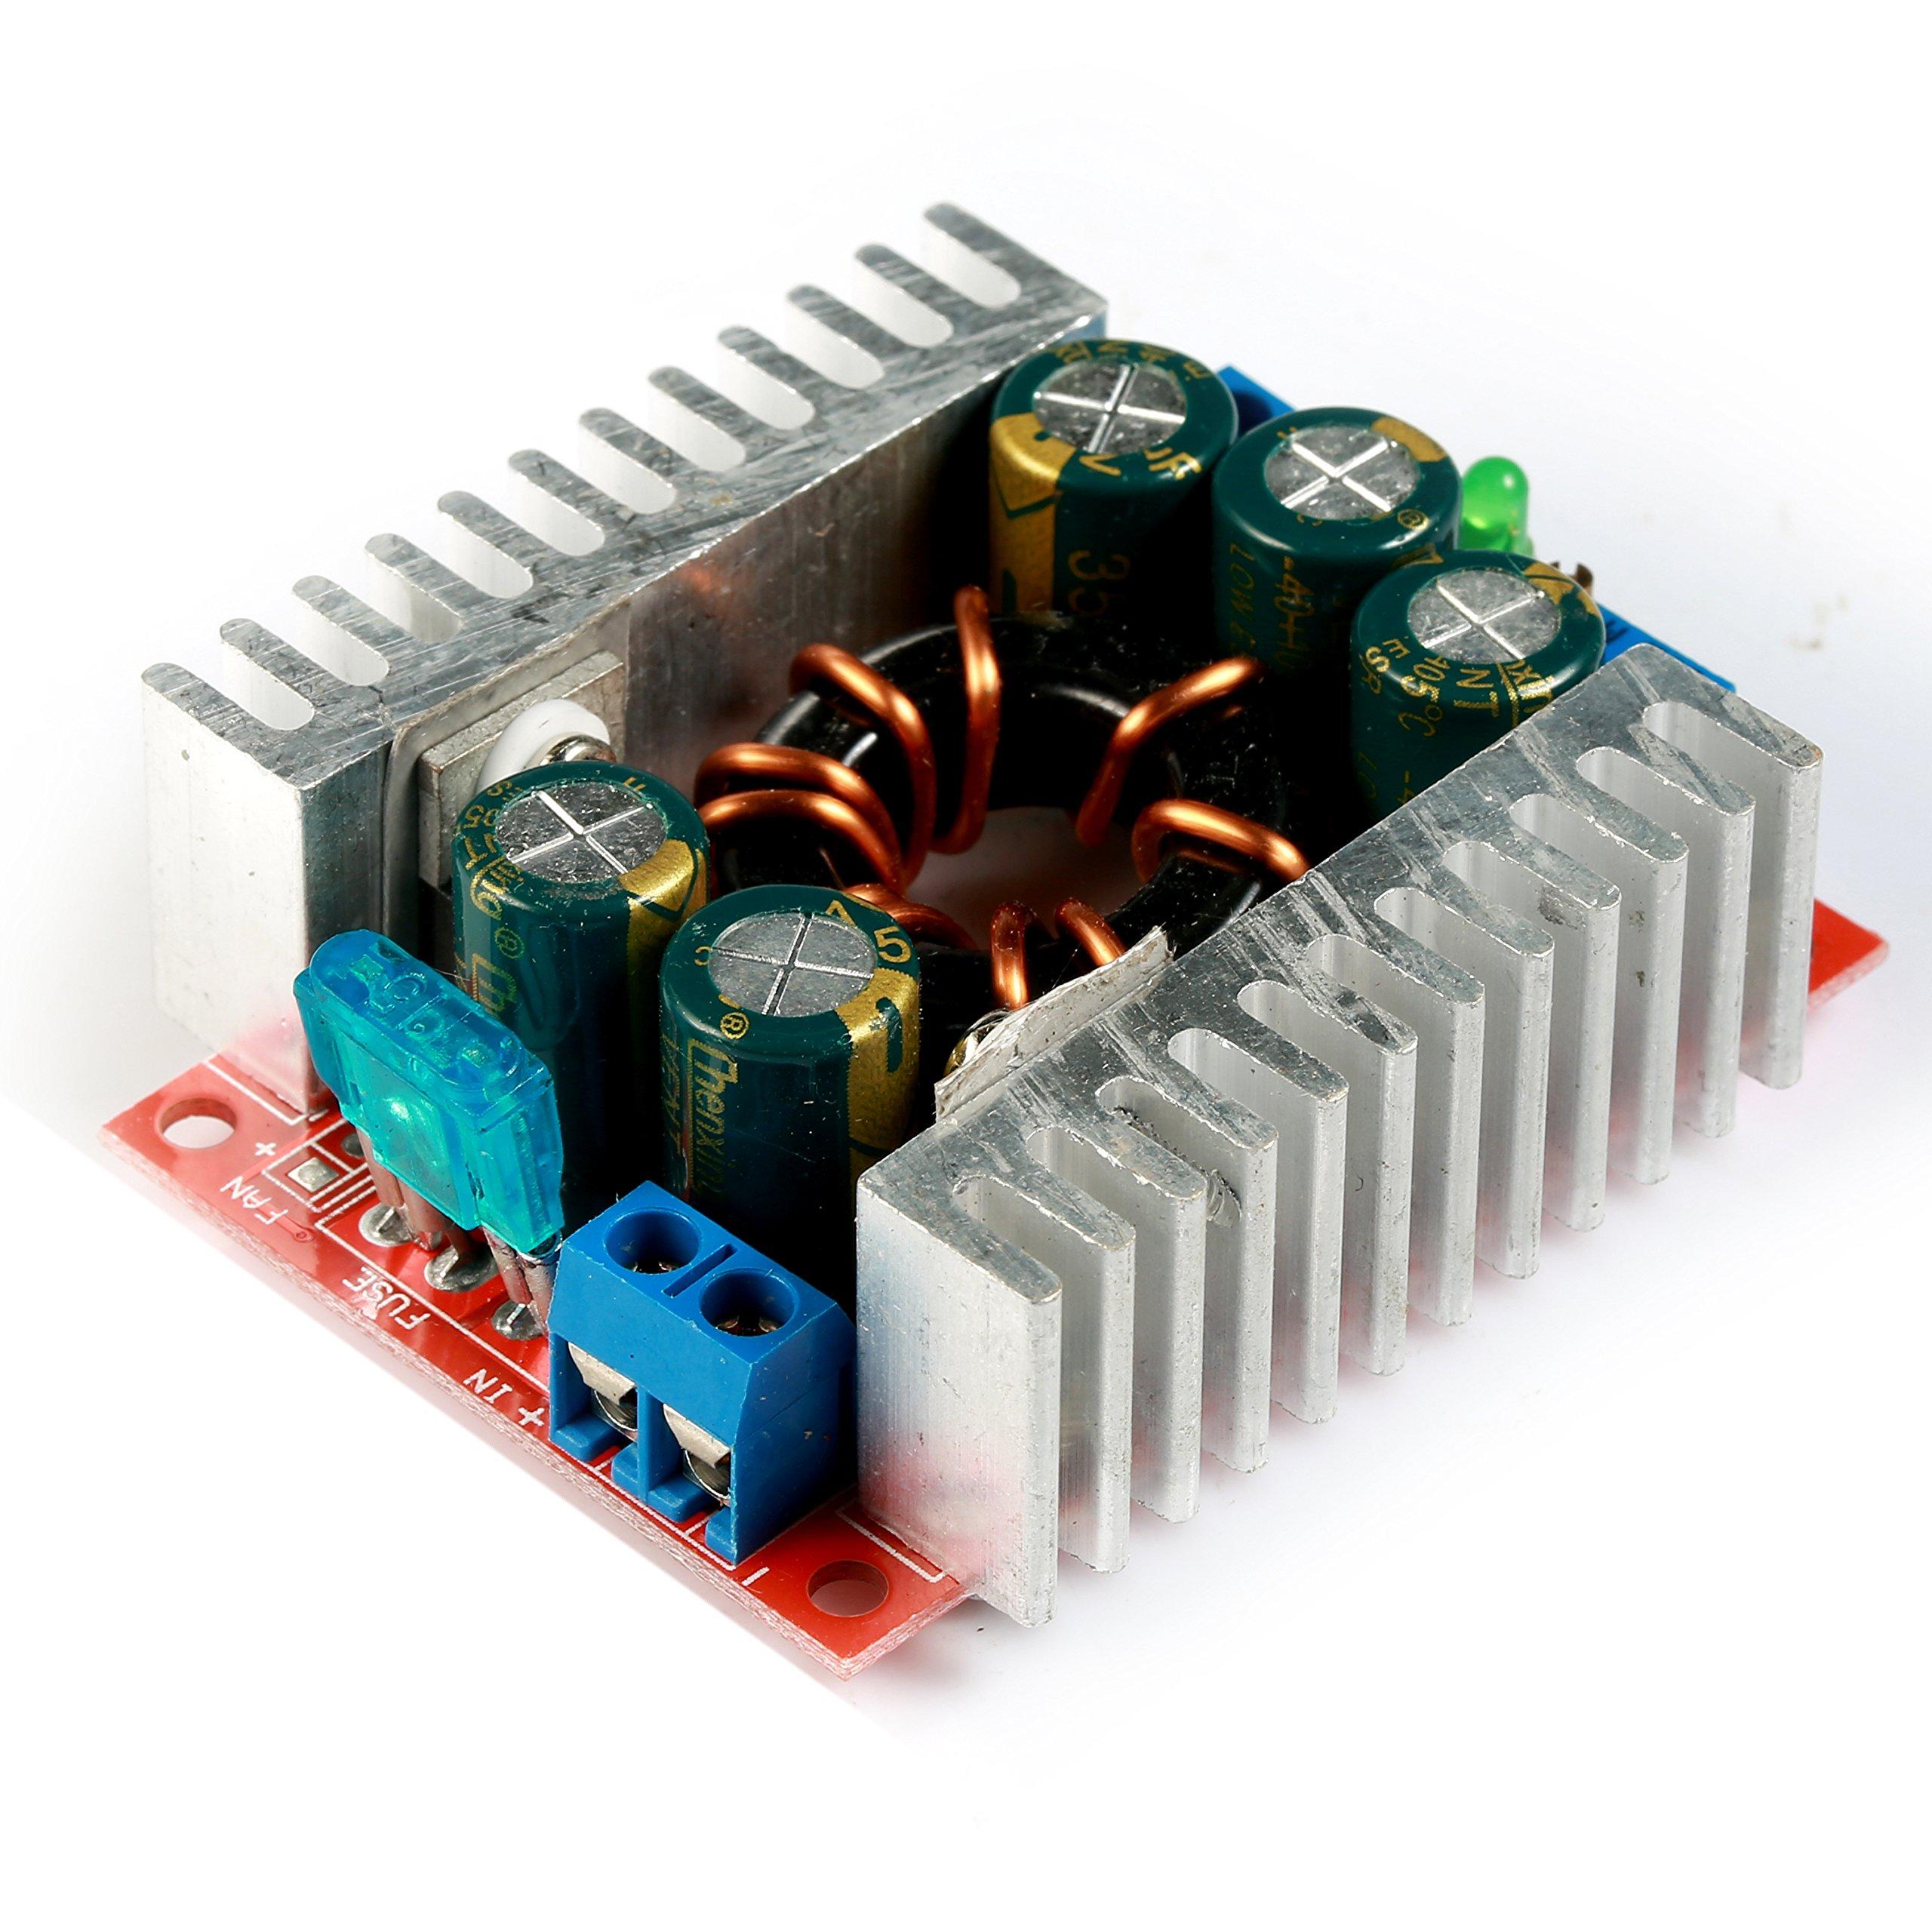 GEREE Mini Buck Voltage Converter DC to DC Step-down Transformer High Power 15A Volt Regulator Board Synchronous Inverter Module 4-30V to 1.2V-29V with Screw Adjustable